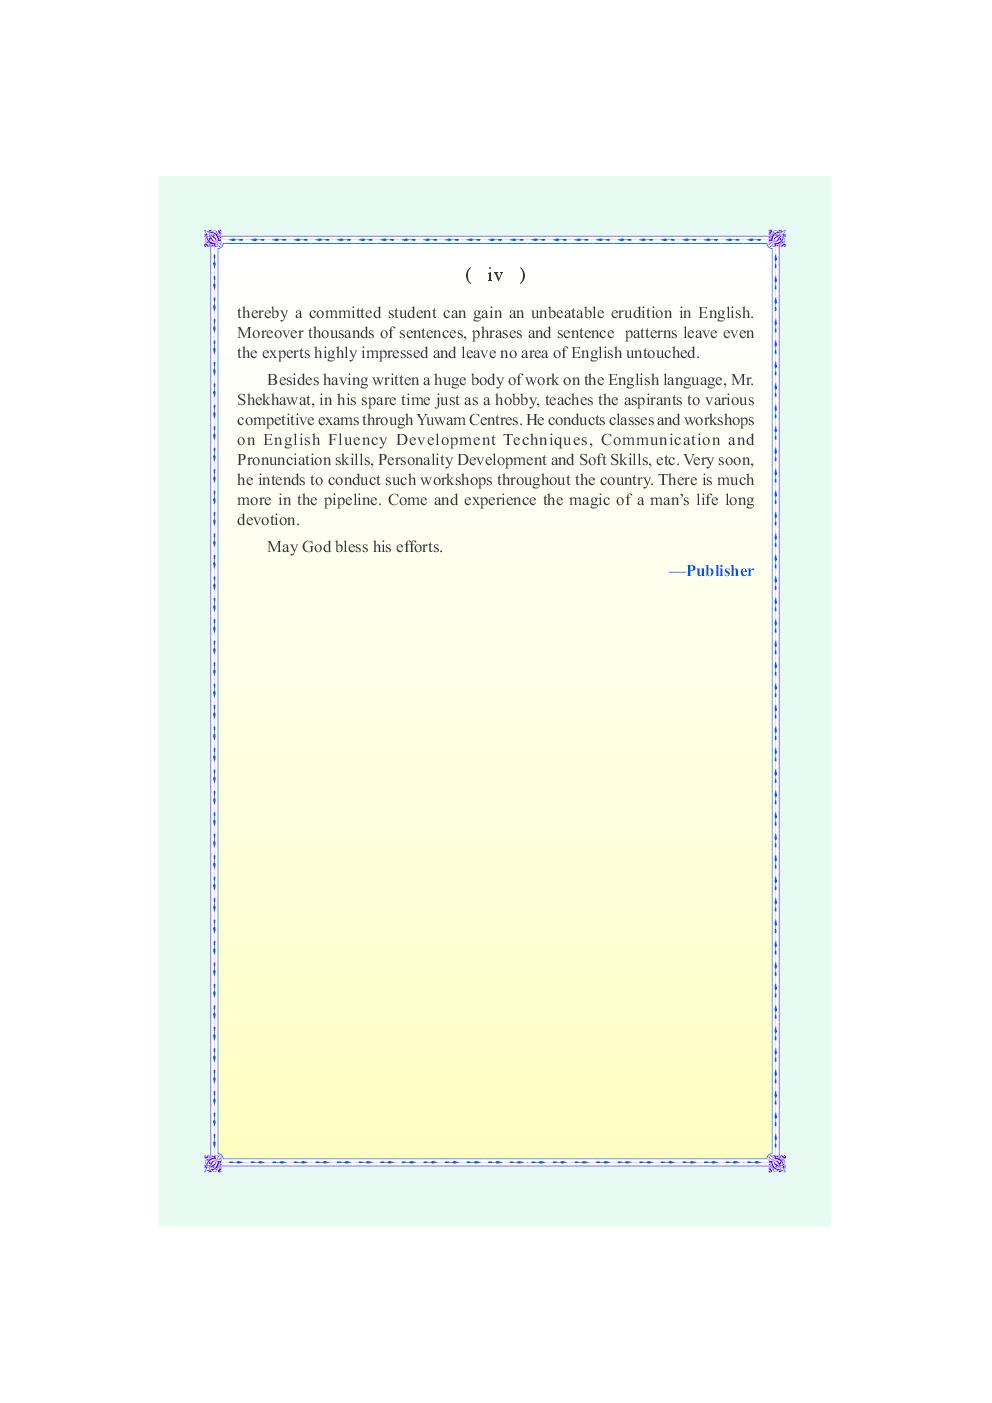 Word Bank for Spoken English (Eng.-Hindi) - Page 5